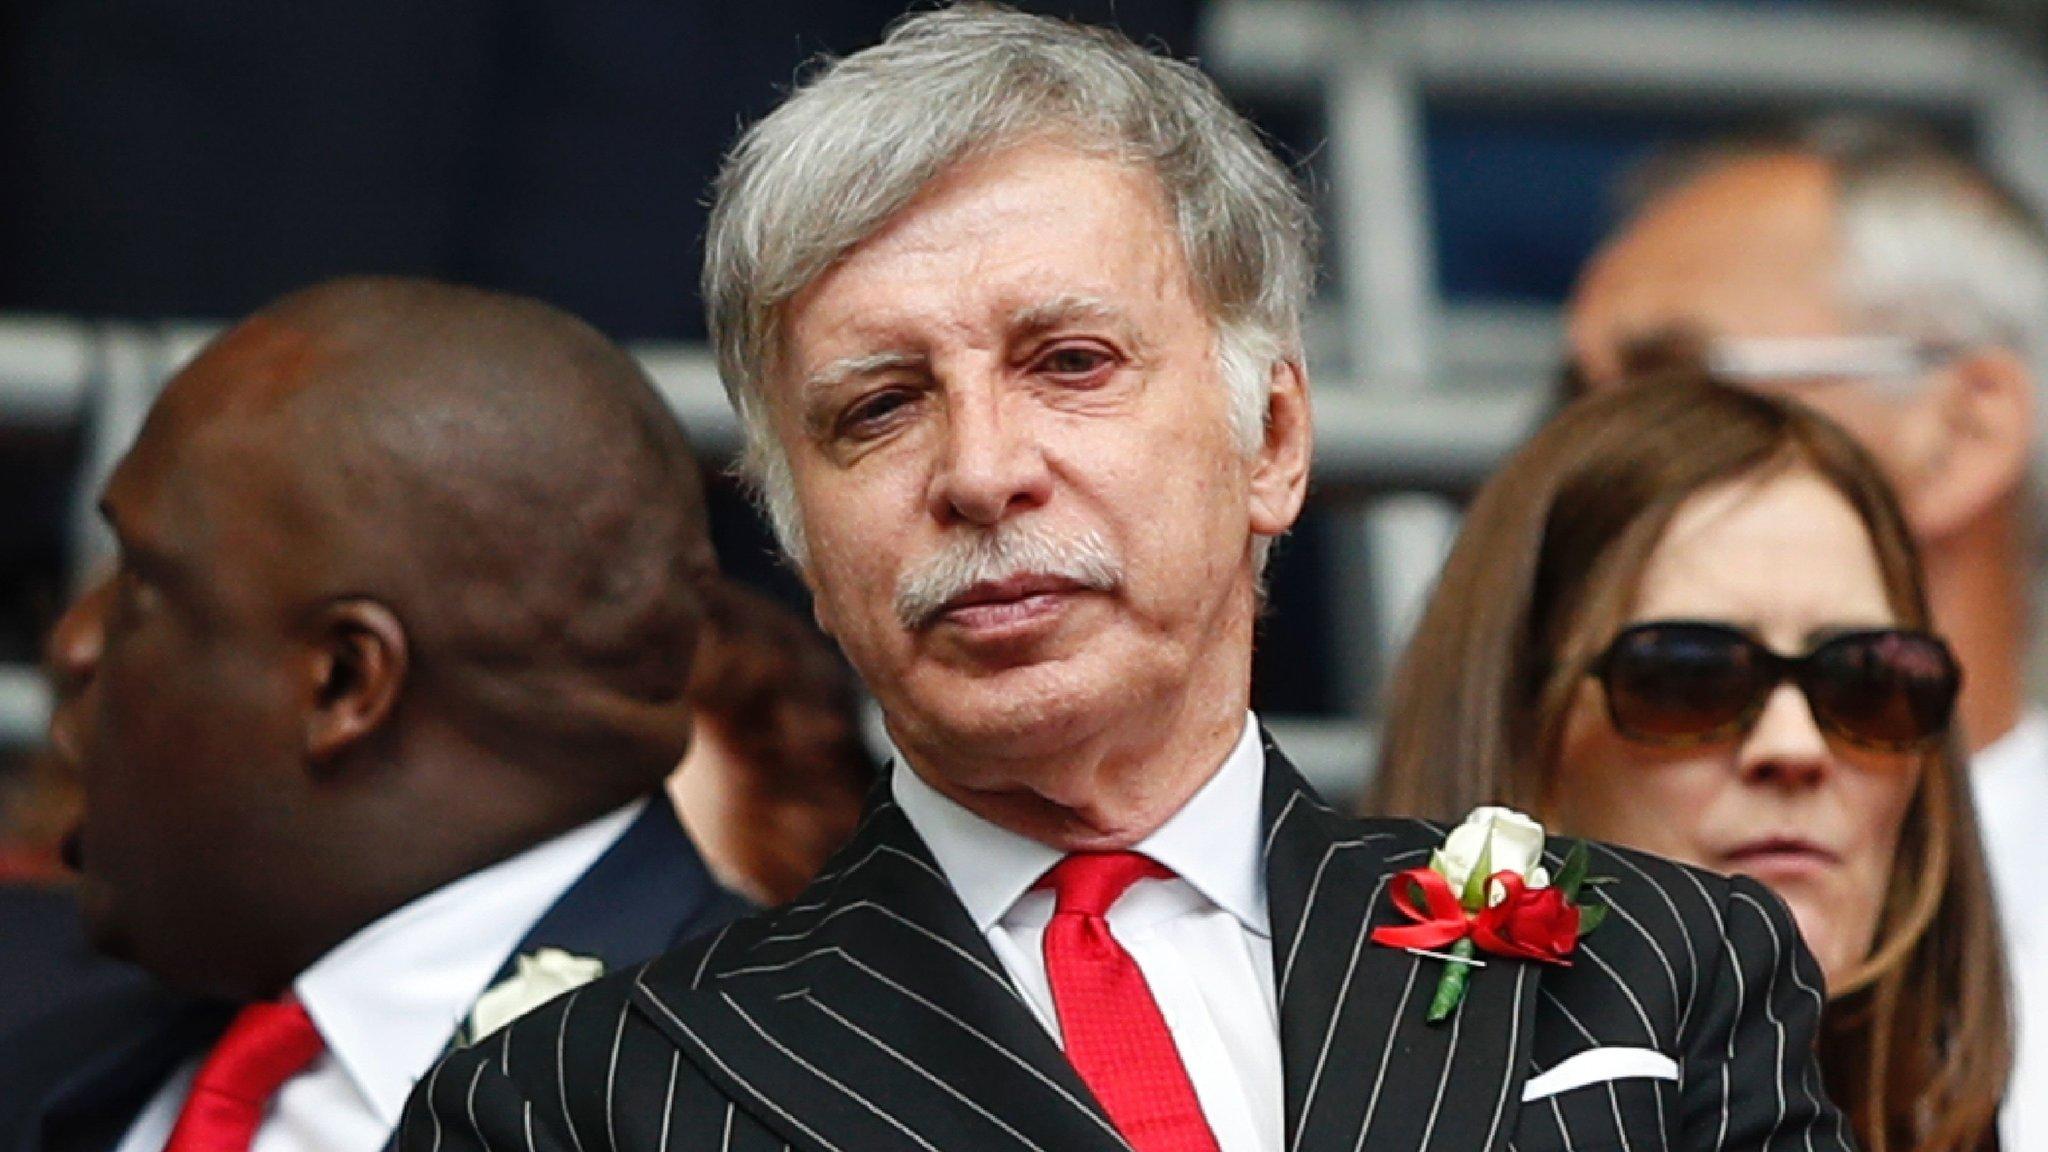 Kroenke offers to buy Arsenal in full in deal valuing club at £1.8bn